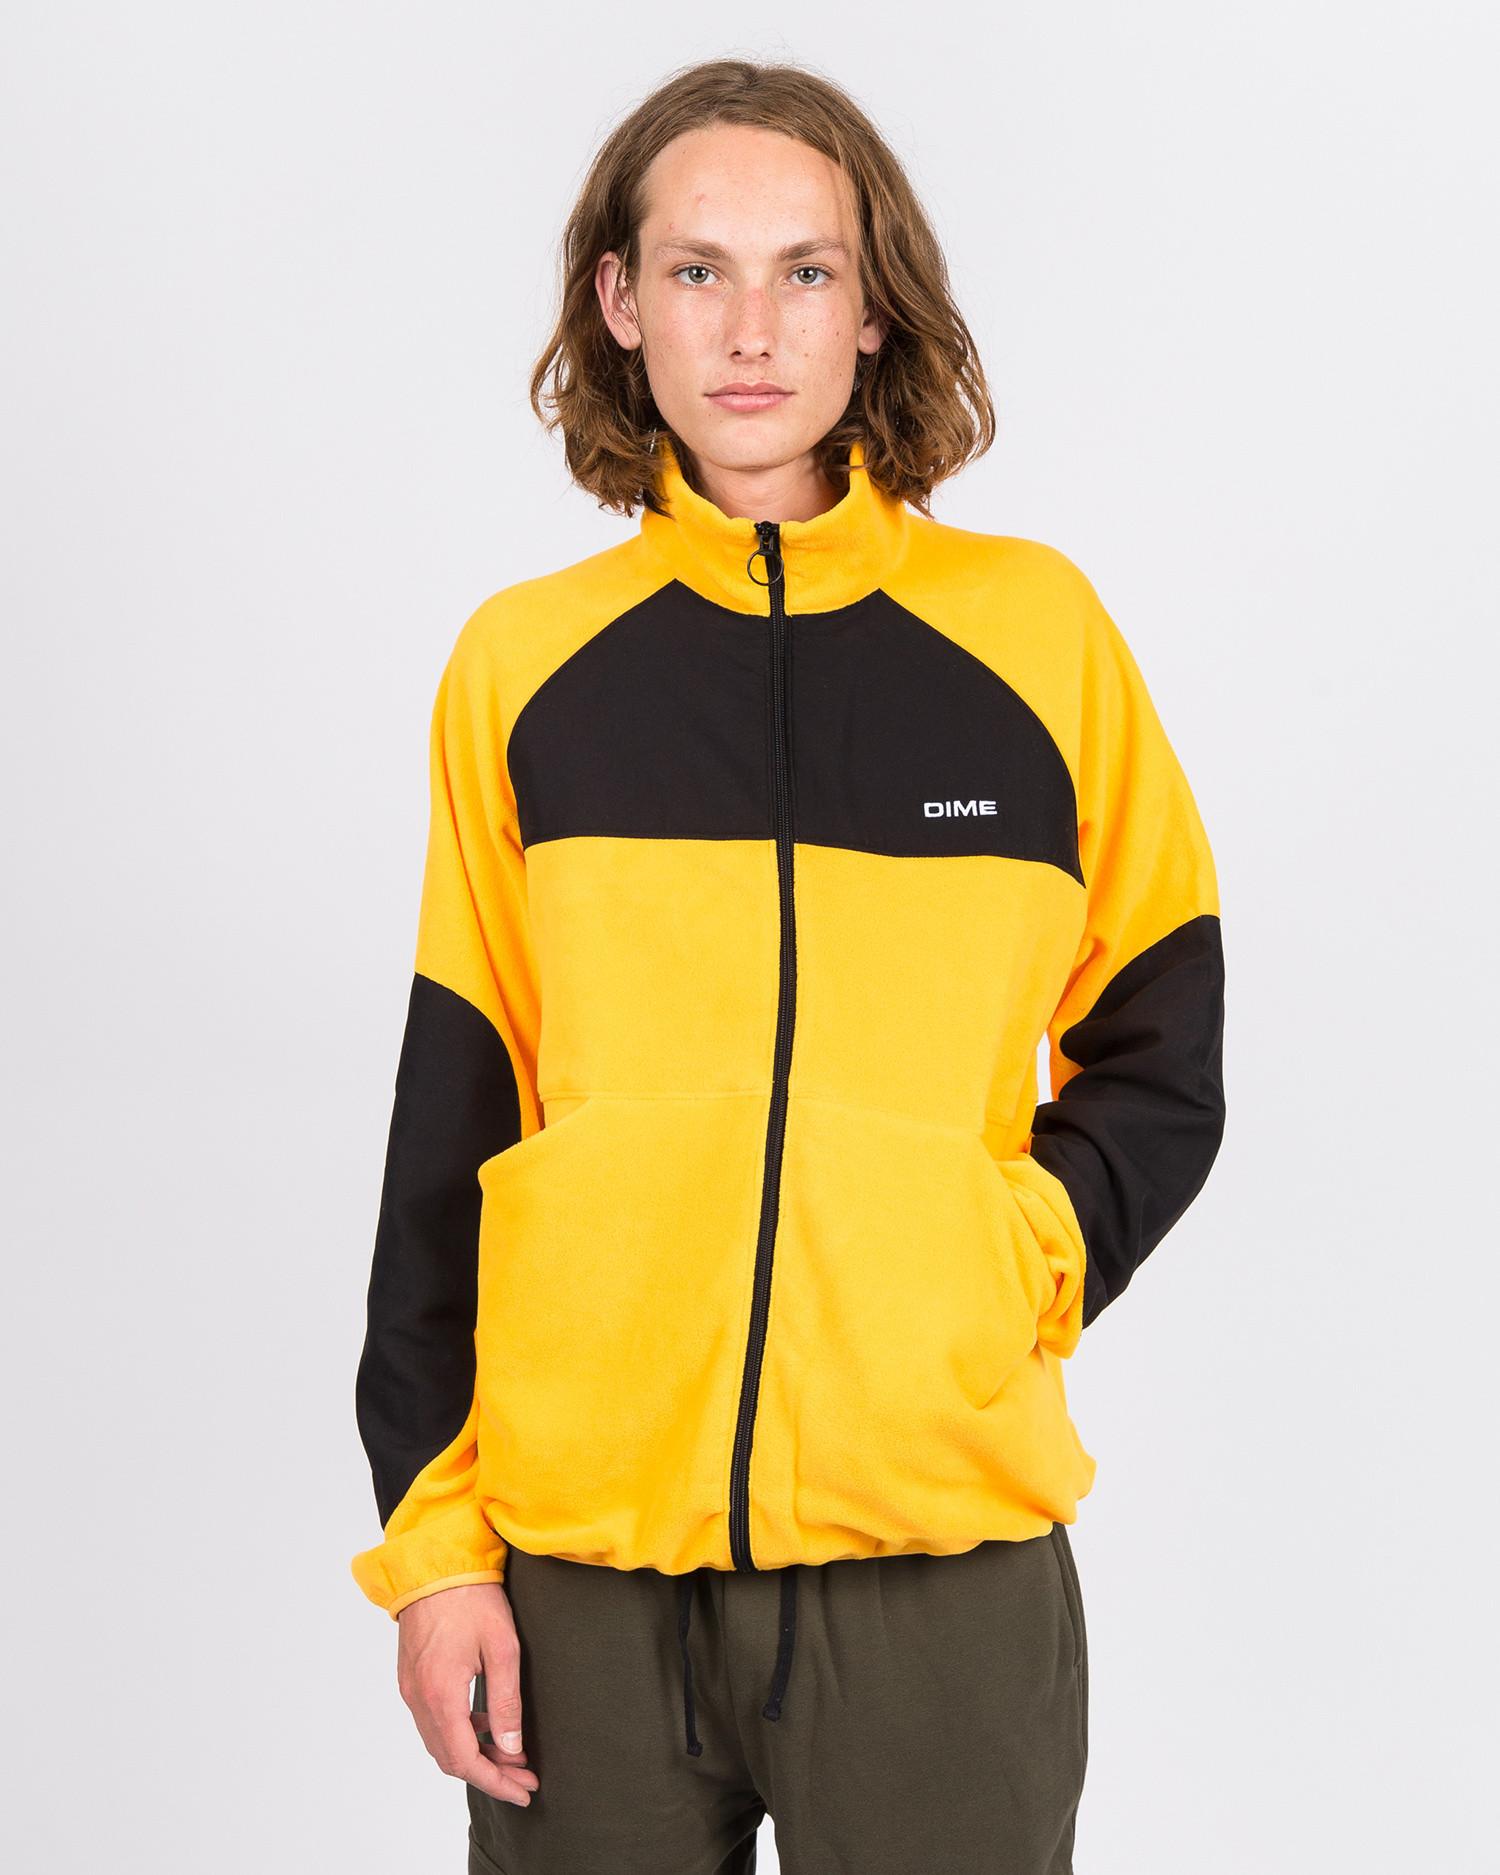 Dime Polar Fleece Track Jacket Gold/Black